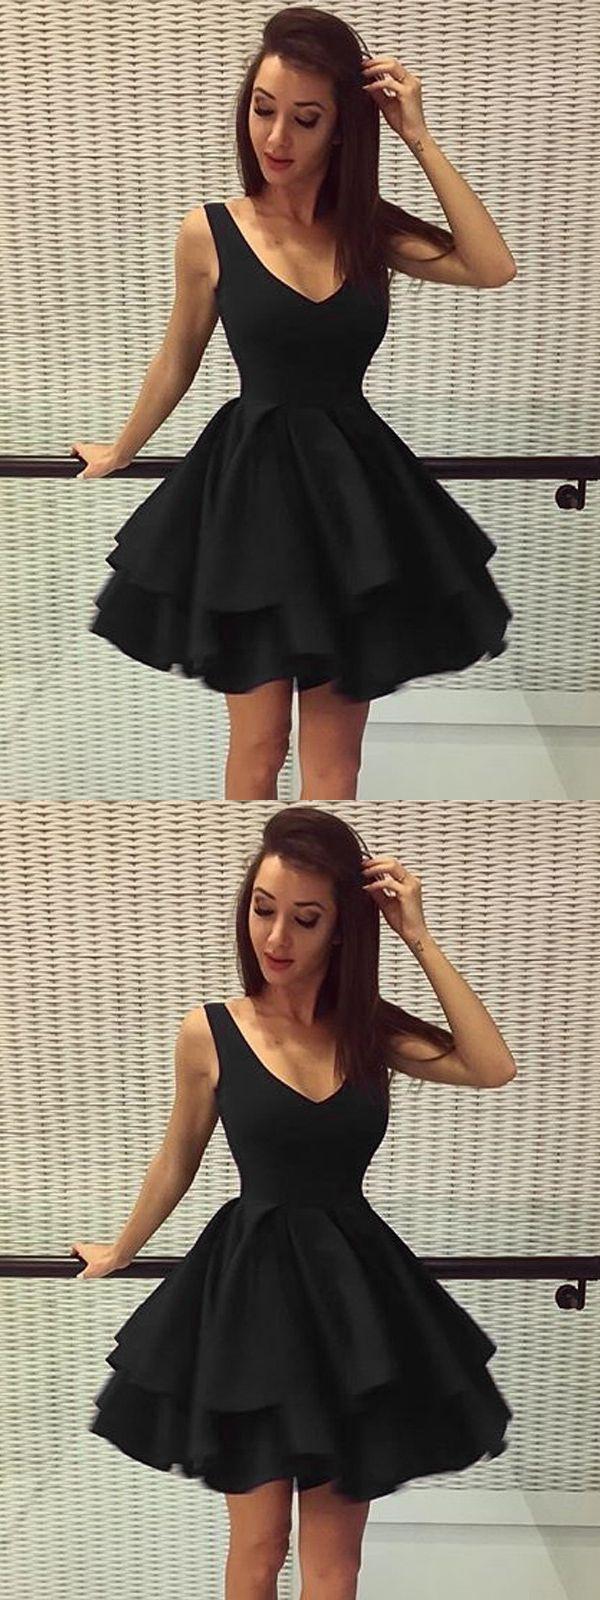 homecoming dresses,short homecoming dresses,cheap homecoming dresses,black homecoming dresses,sexy homecoming dresses